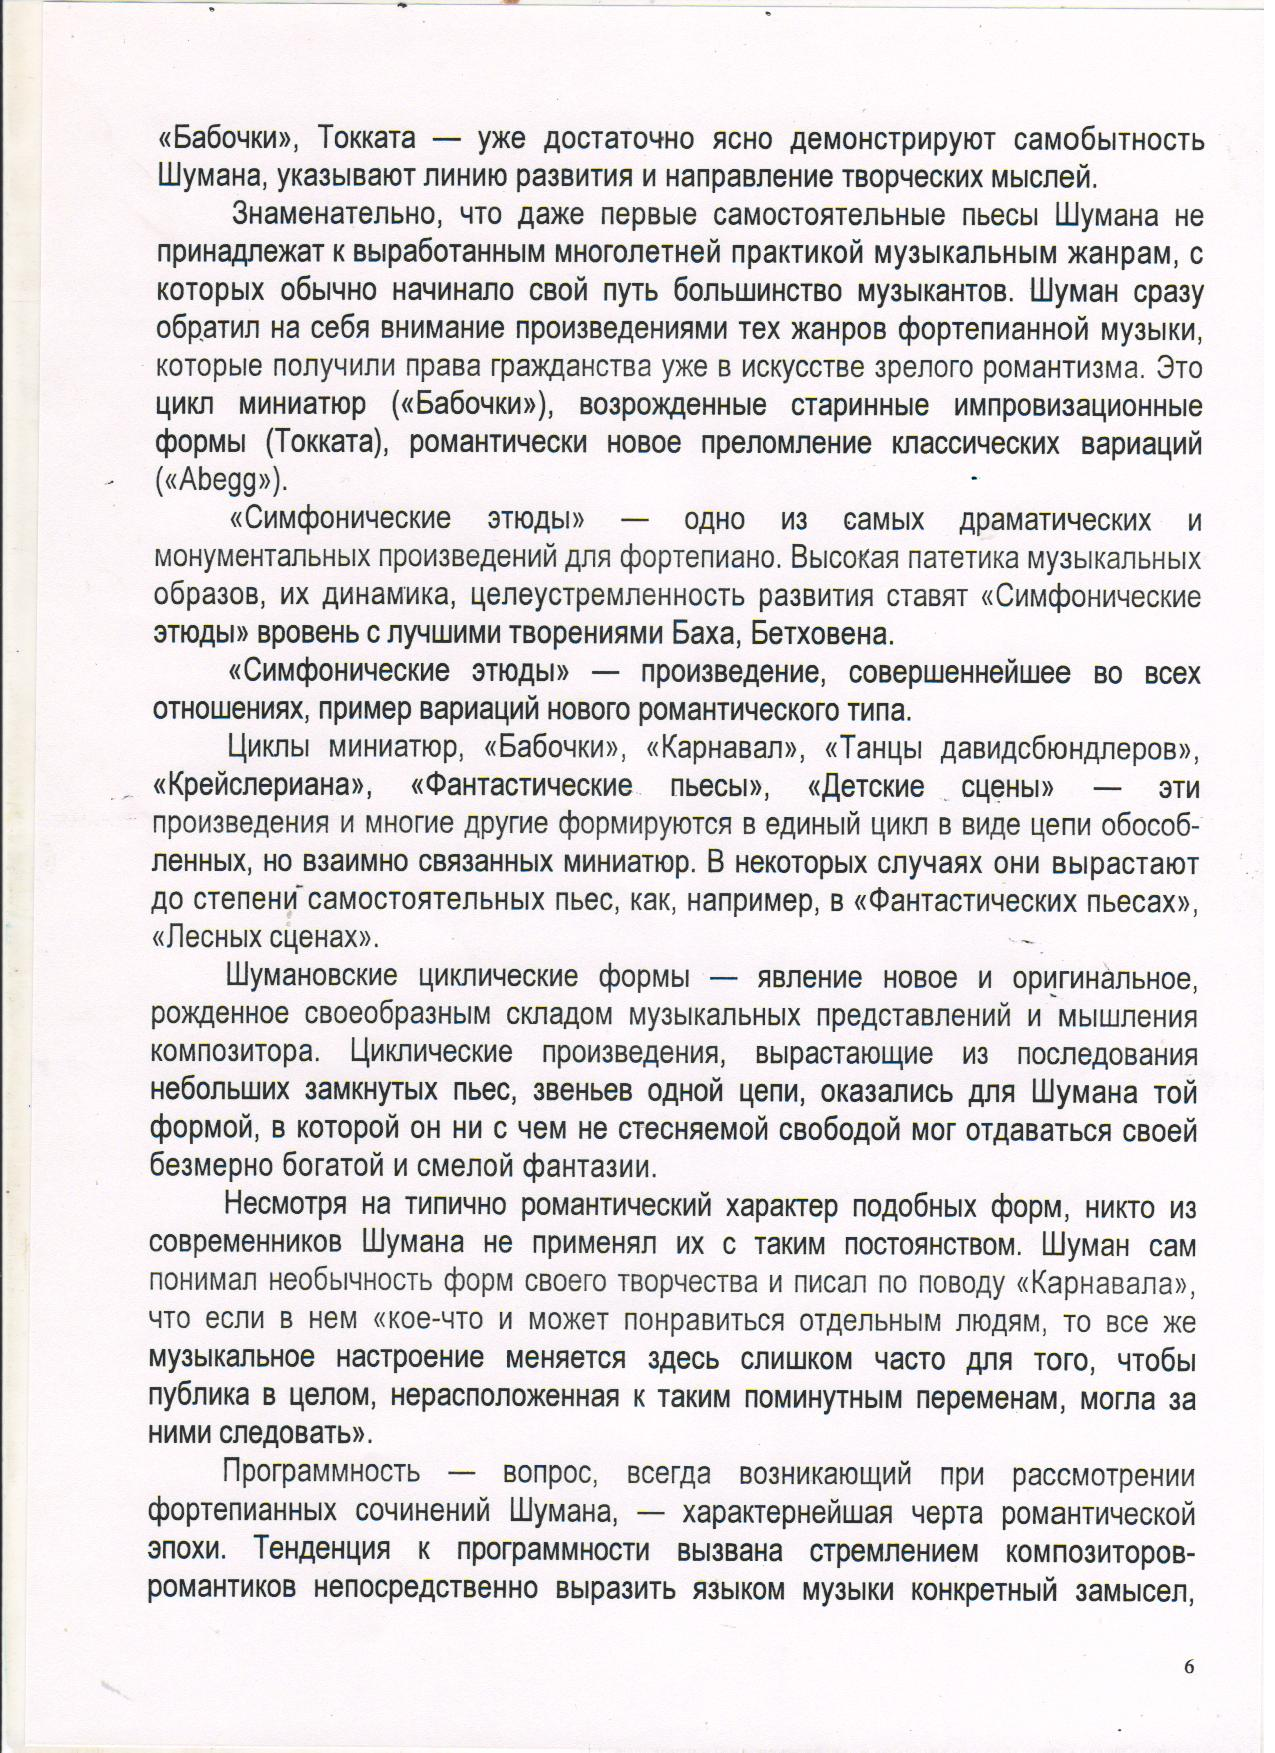 C:\Documents and Settings\Учитель\Рабочий стол\Шуман 6.jpg